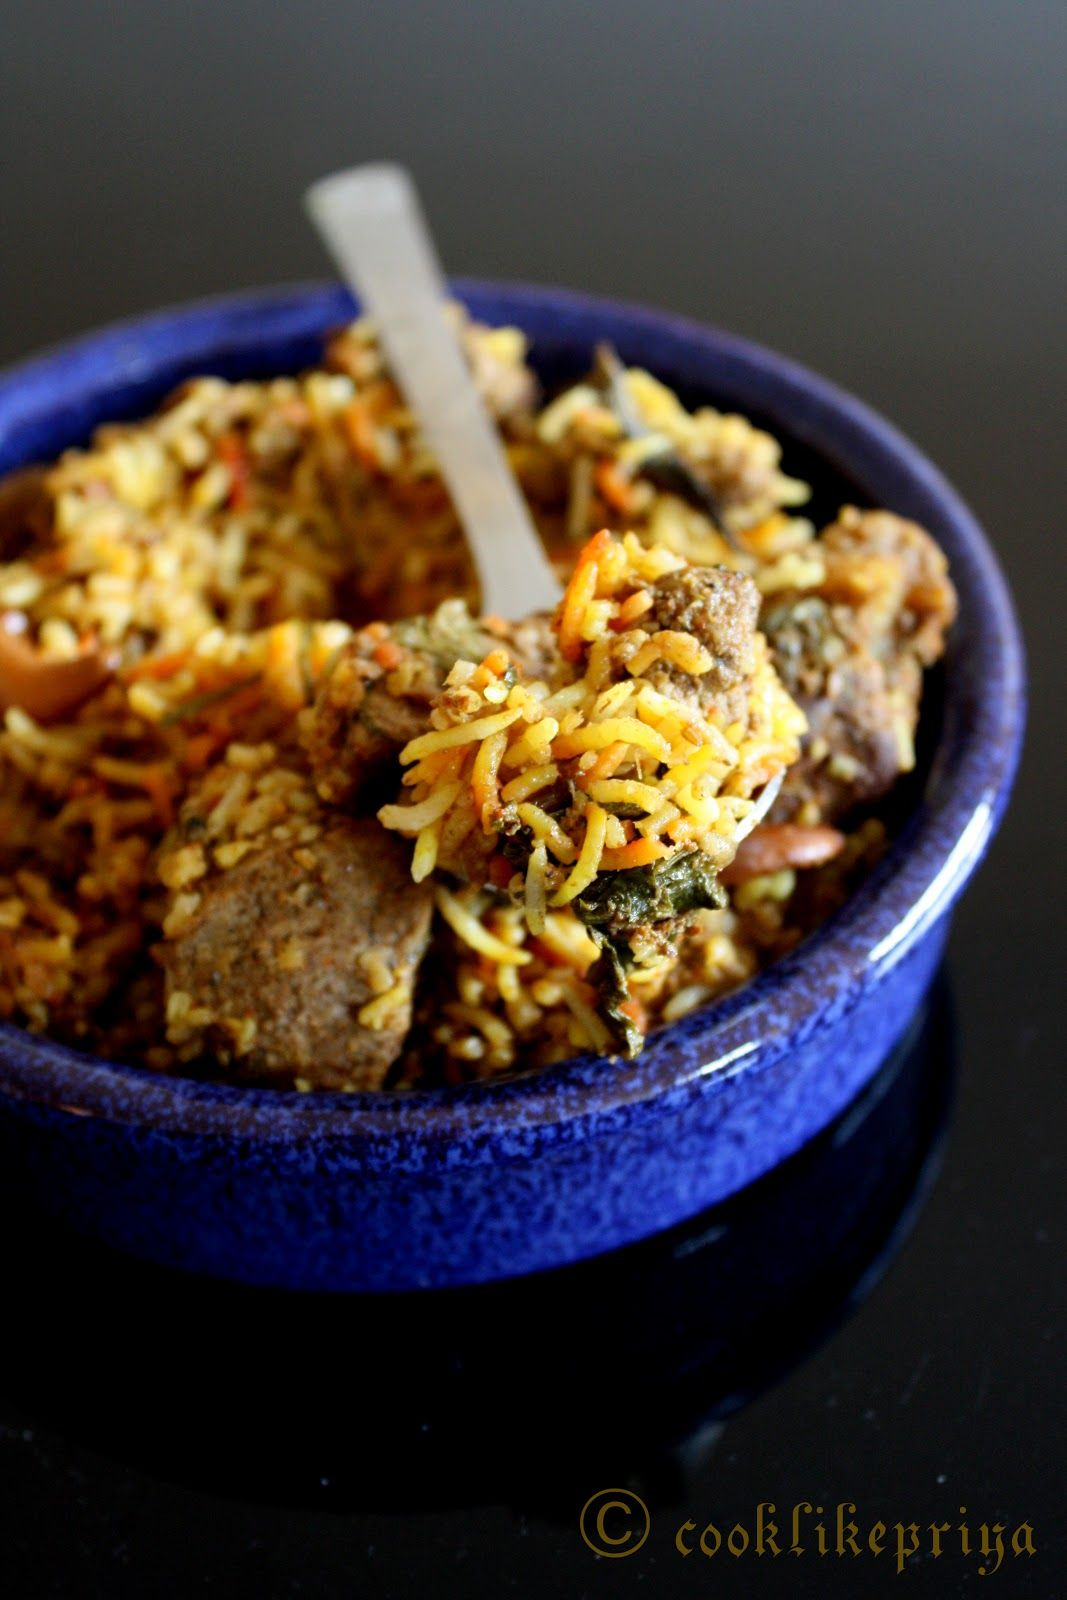 Cook like priya hyderabadi mutton biryani kachi biryani food forumfinder Image collections